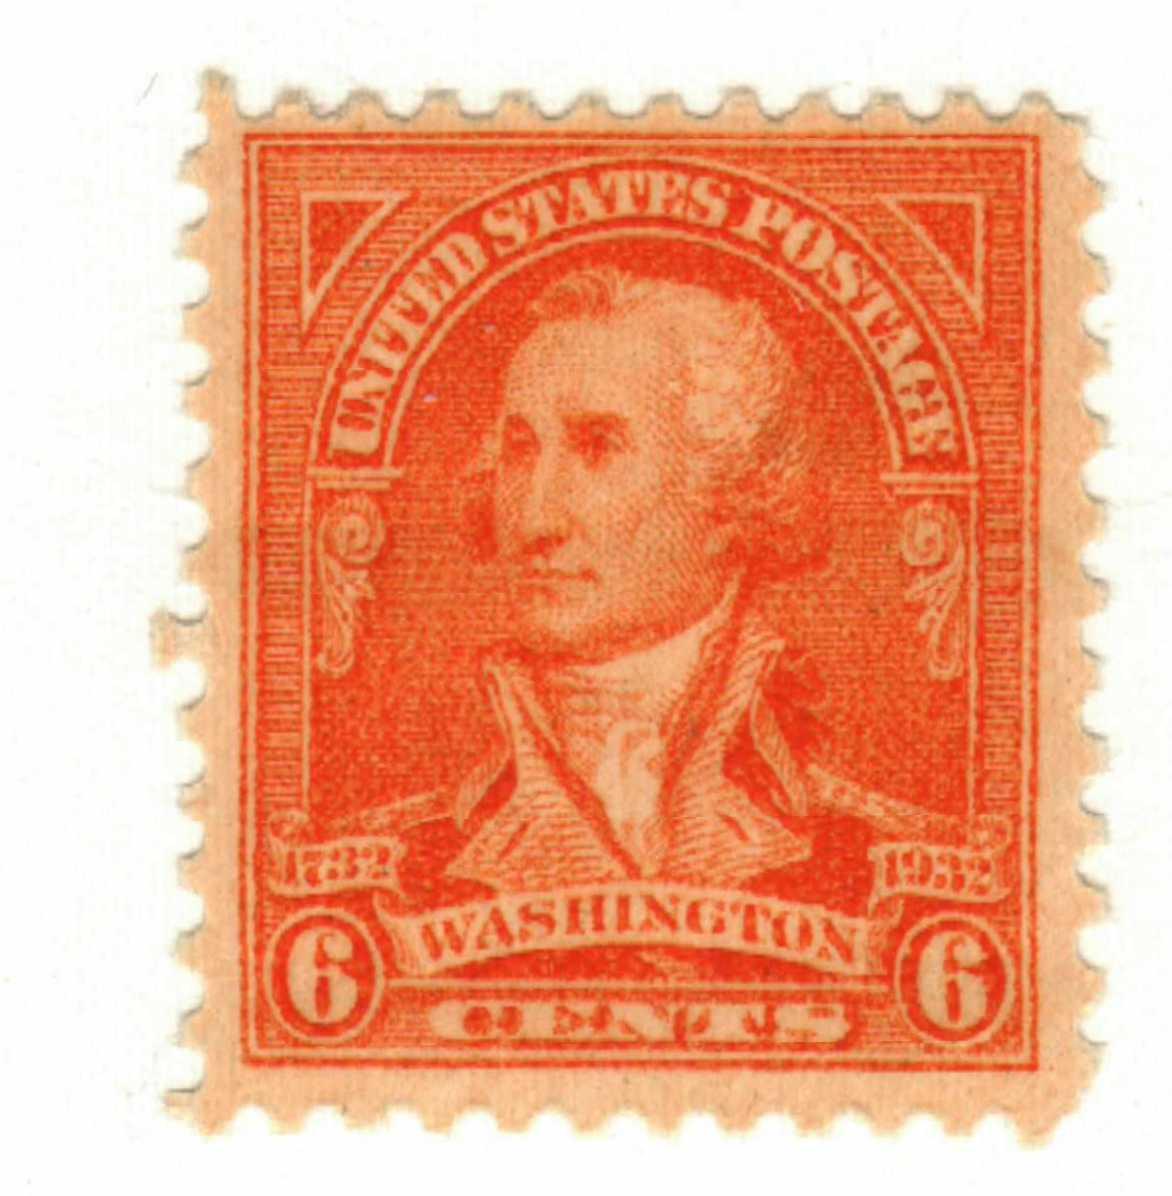 1932 Washington Bicentennial: 6c Washington by John Trumbull